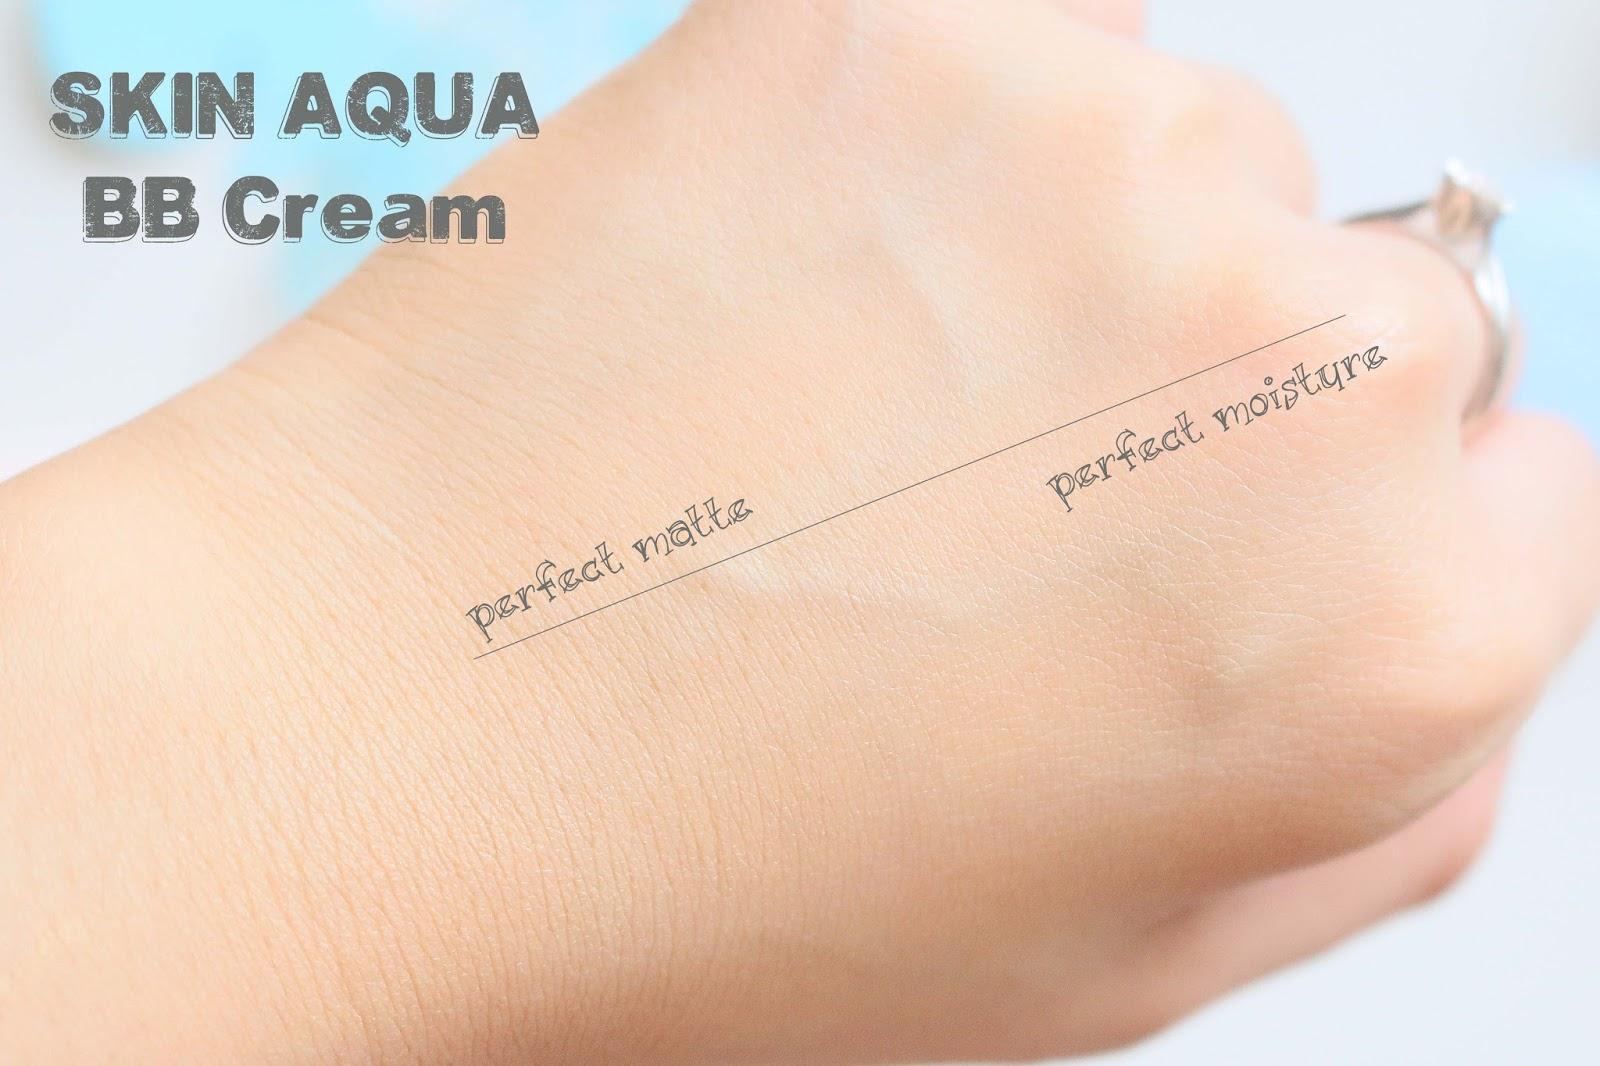 skin aqua, bb cream, makeup, review, japan, everyday, perfect matte, perfect moisture, swatches